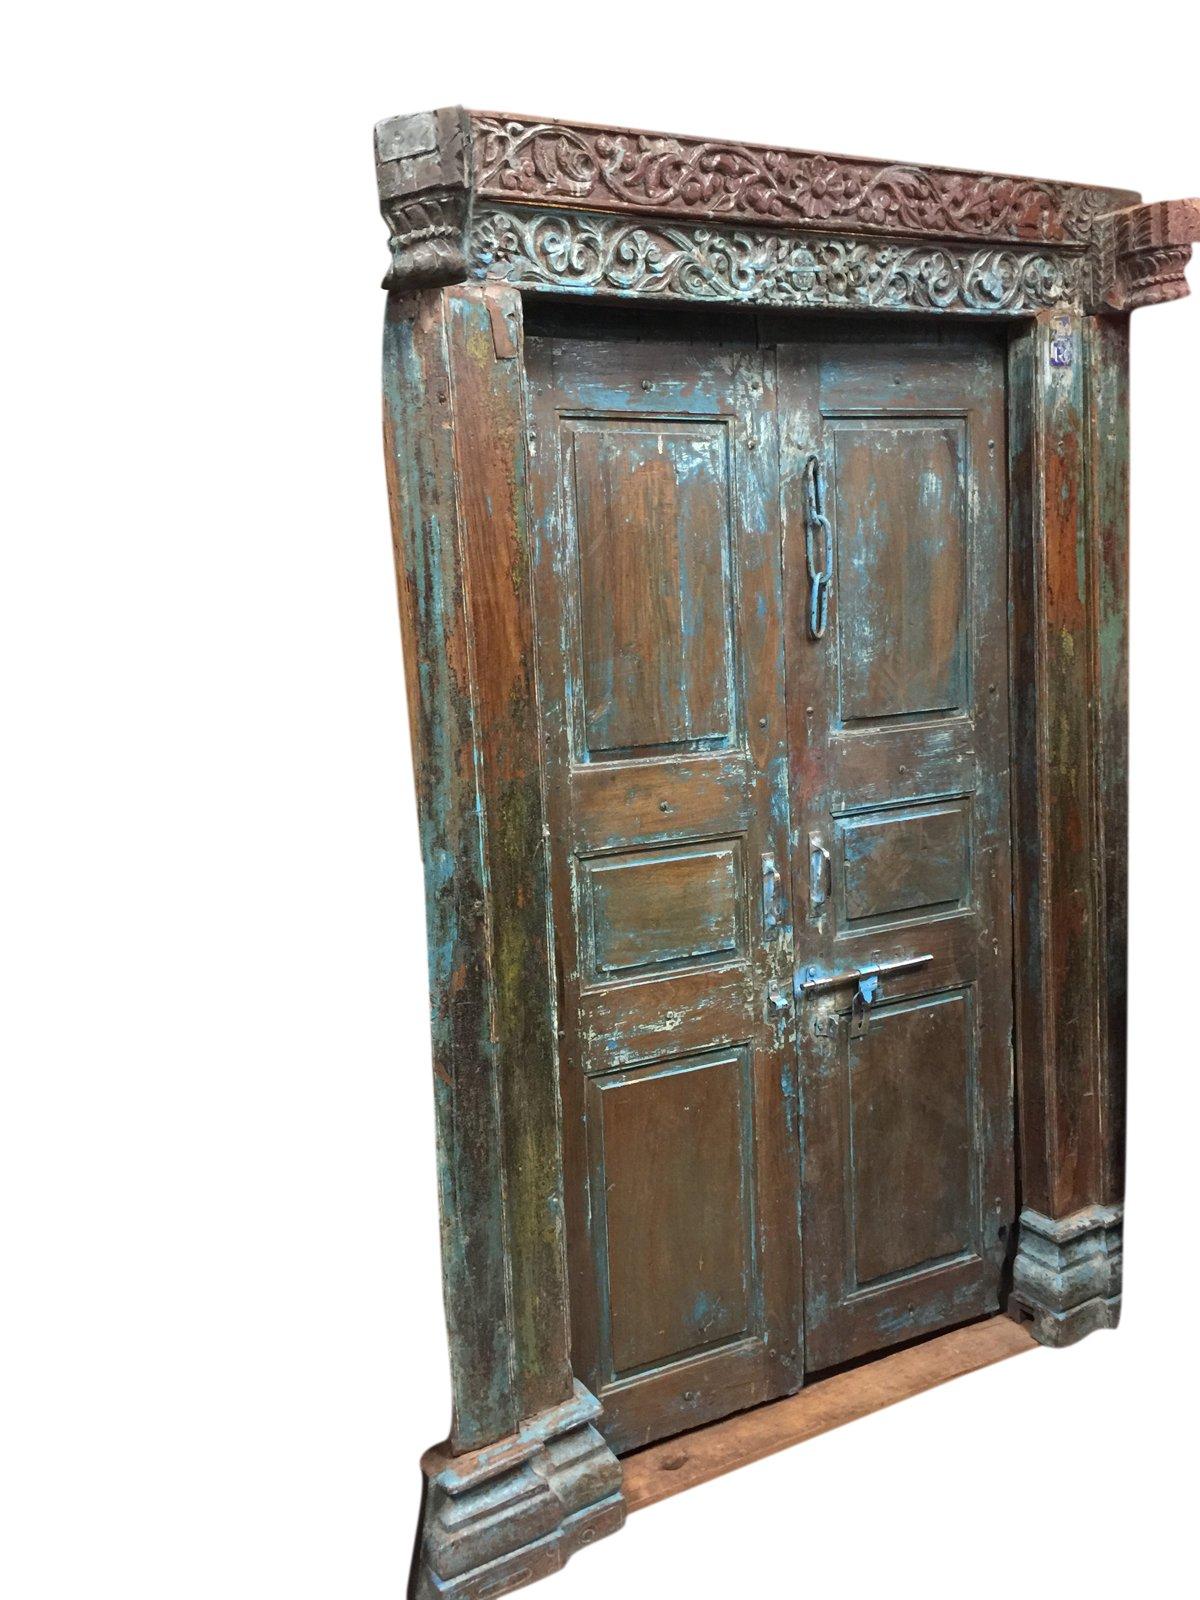 Mogulinterior Antique Jaipur OM Carved Doors Blue Patina Teak Doors & Frame by Mogul Interior